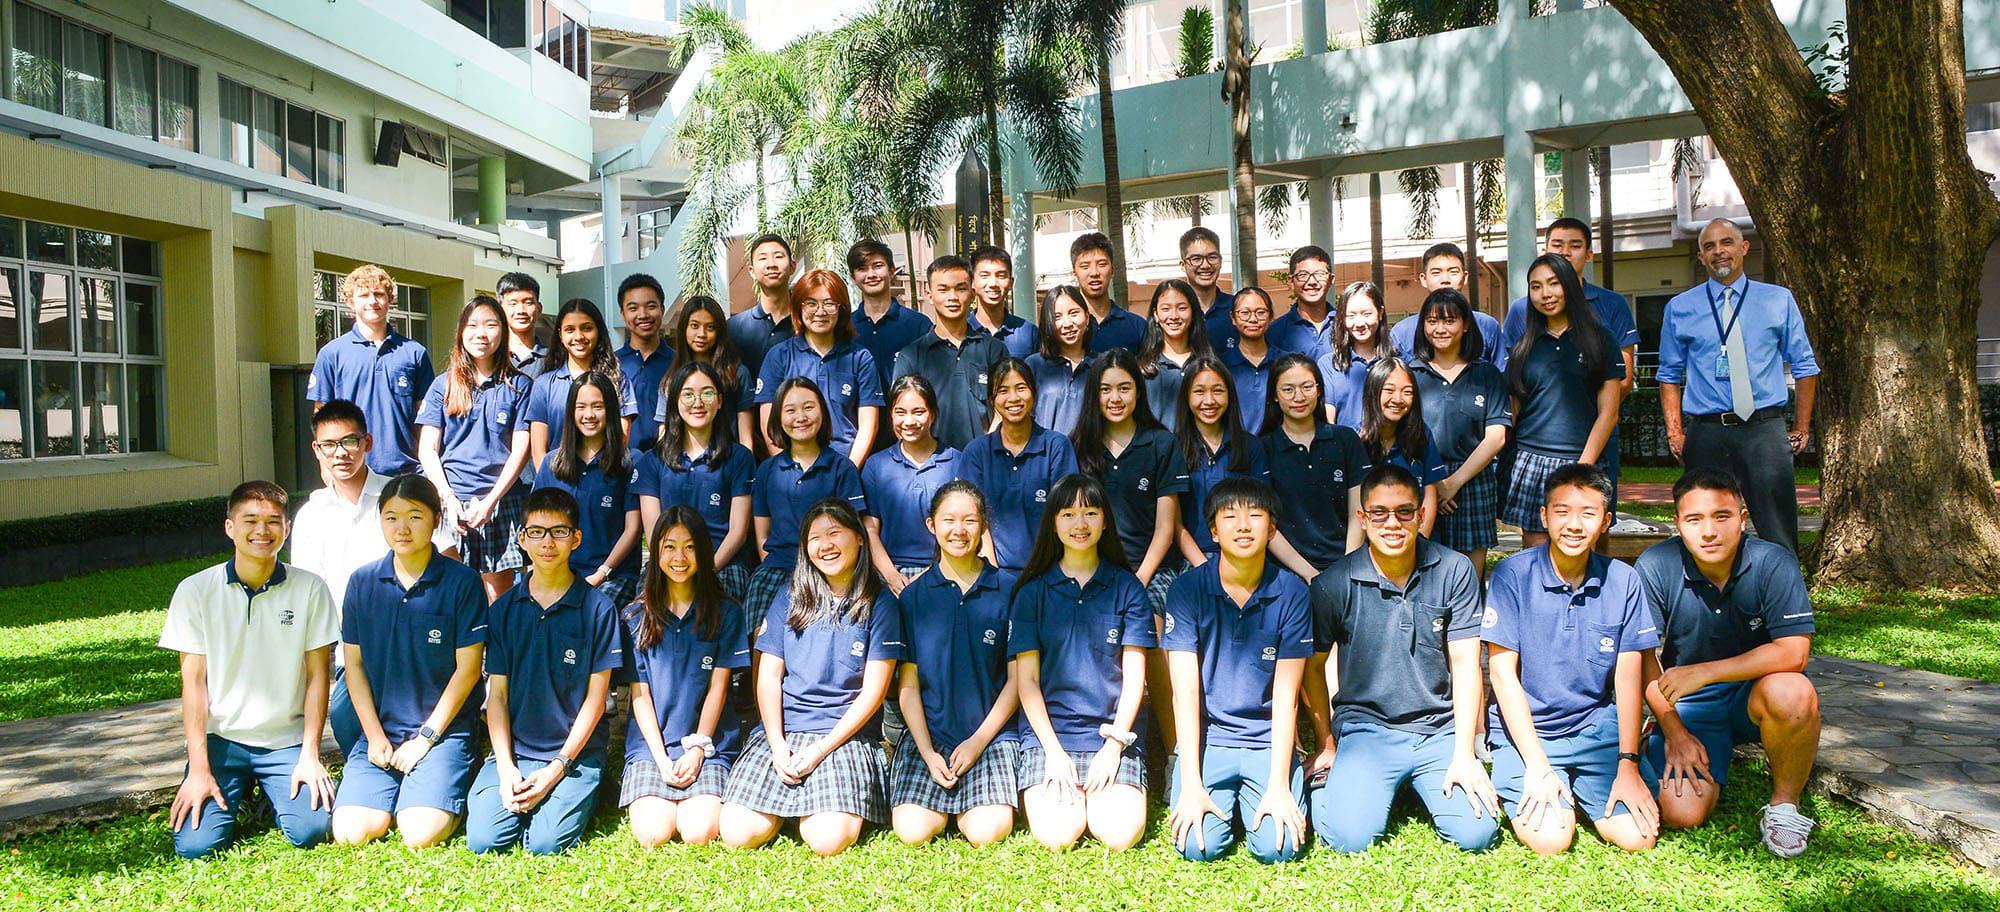 High School Student Council